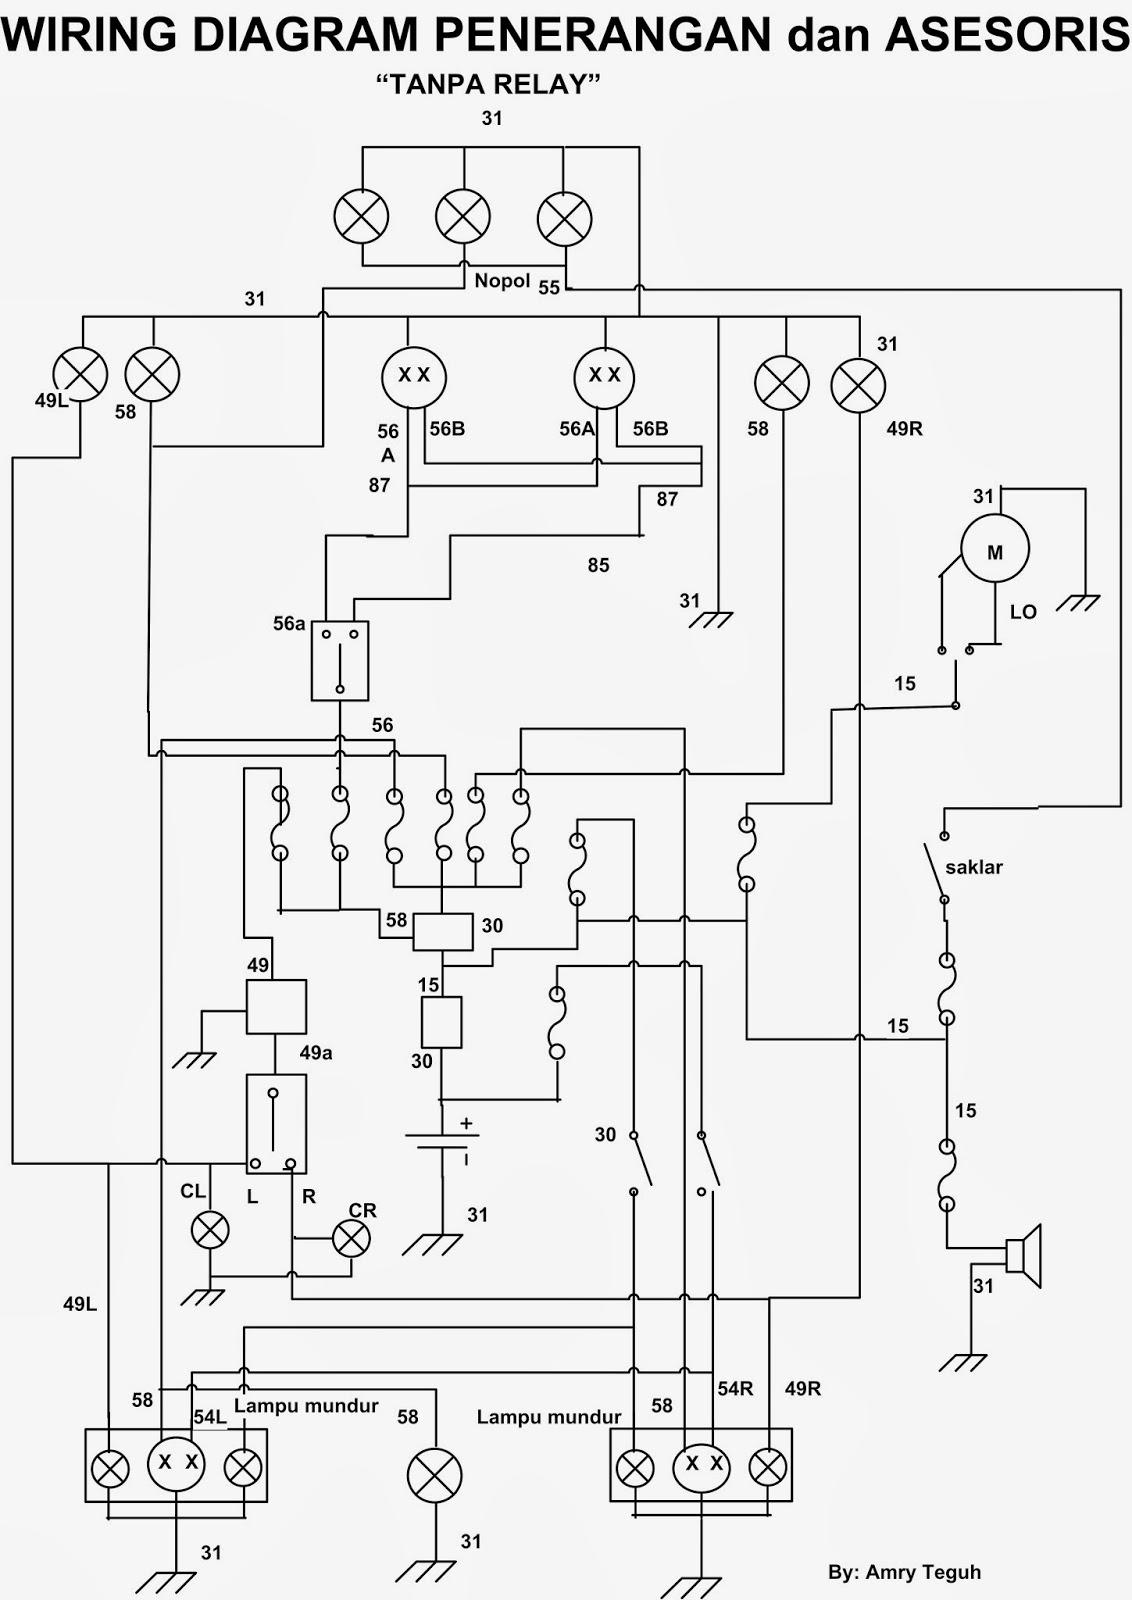 Wiring Diagram Penerangan Mobil Hd Quality Schematic Diagram Altalangaleader It